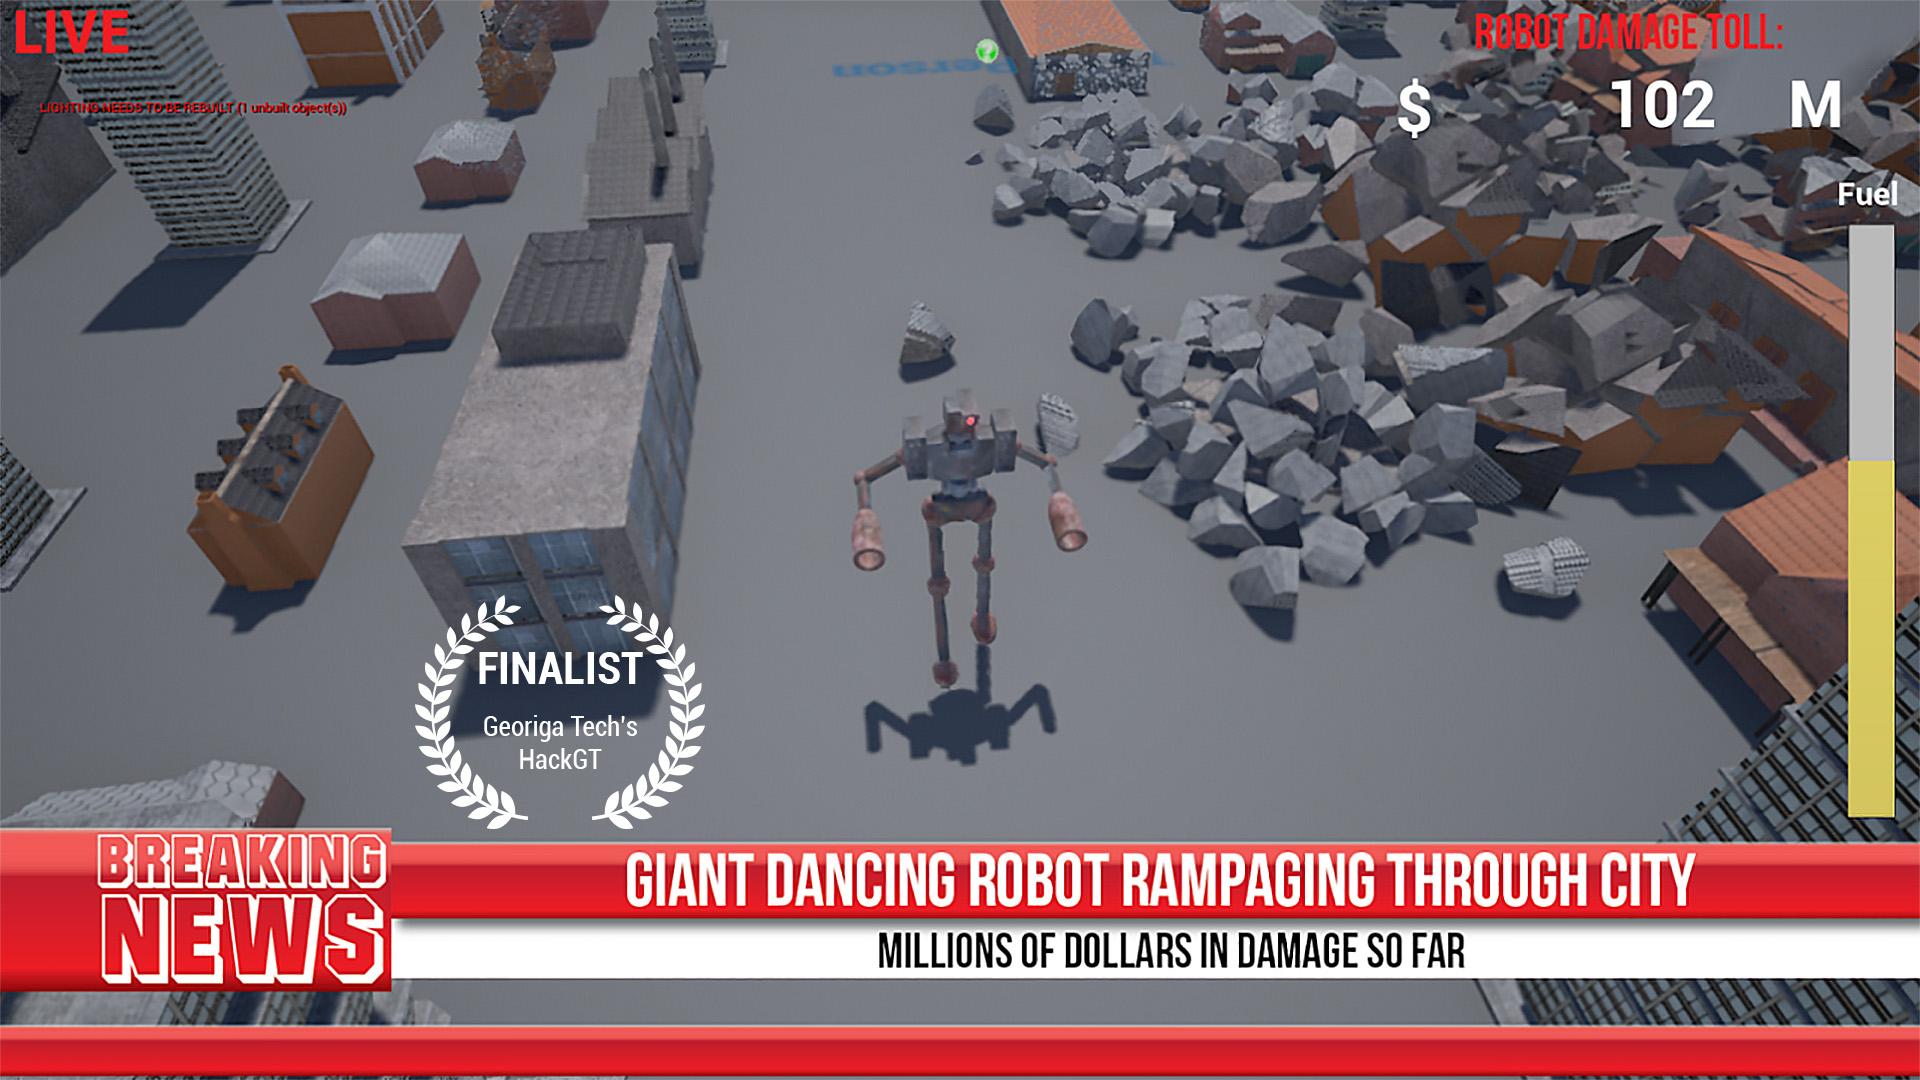 Real Robot Rampage